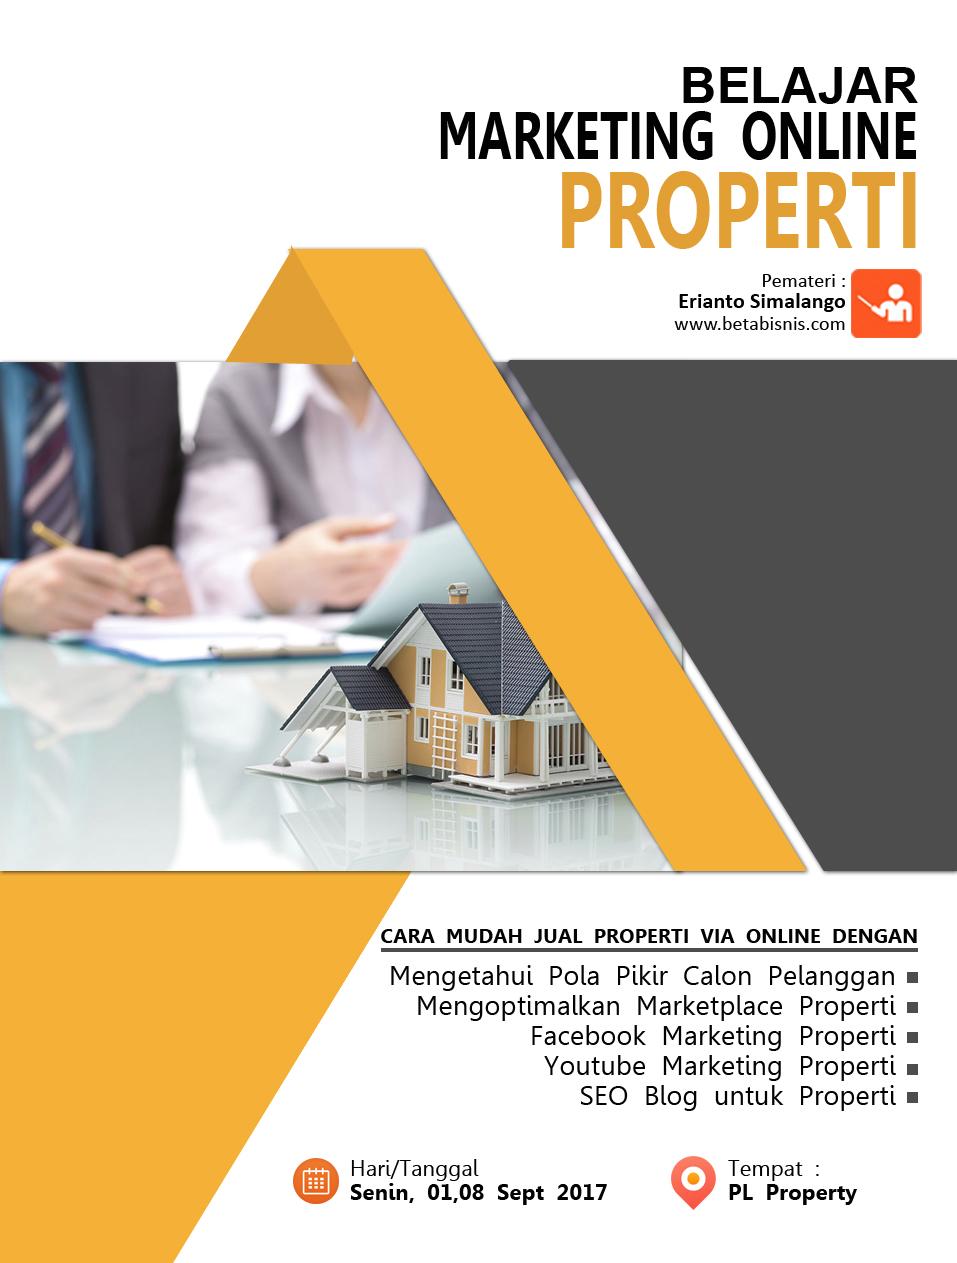 Internet Marketing Property Pekanbaru